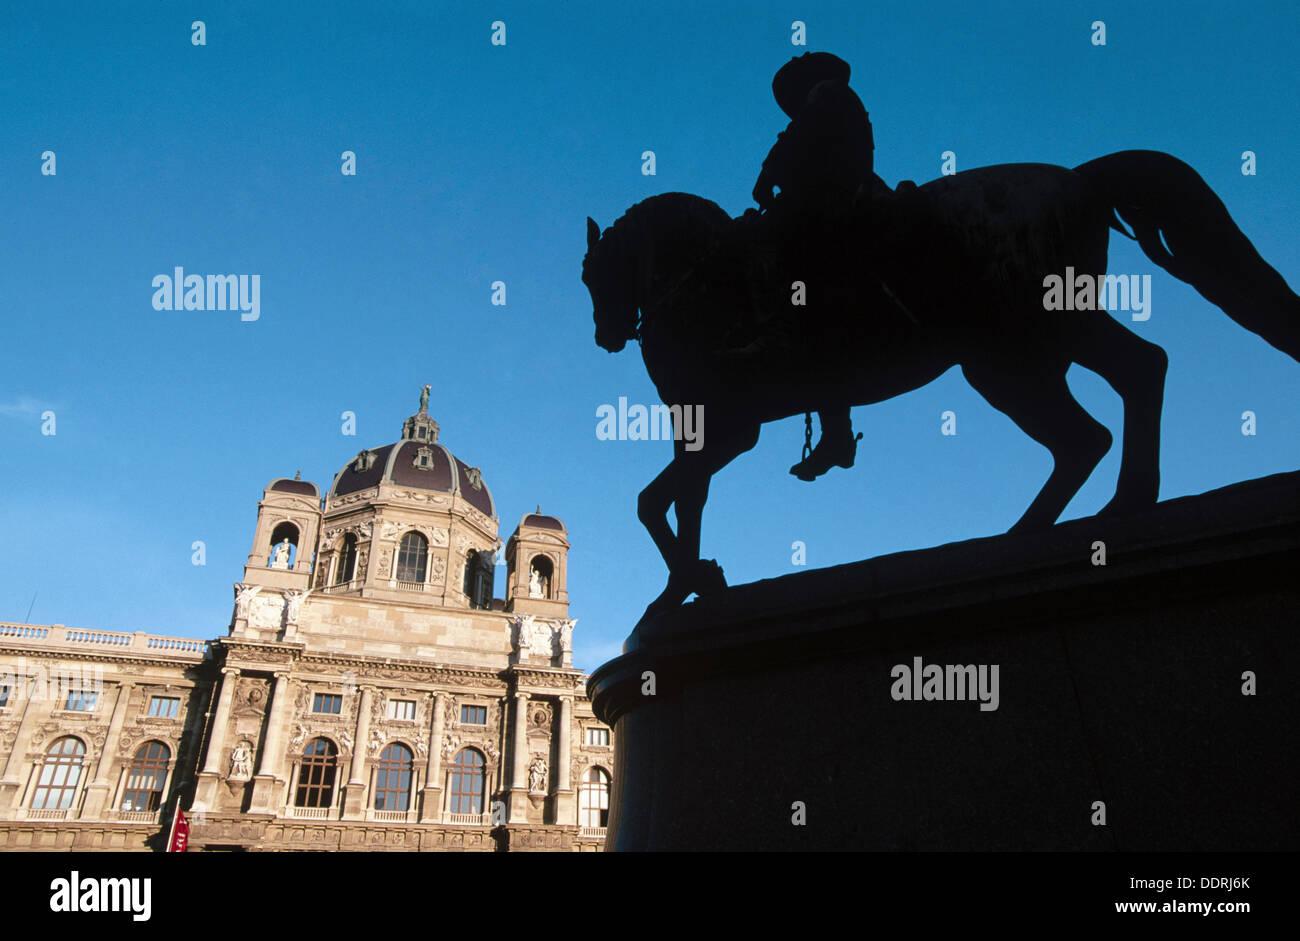 Art History Museum (Kunsthistorisches Museum) in Maria-Theresien-Platz. Vienna, Austria Stock Photo